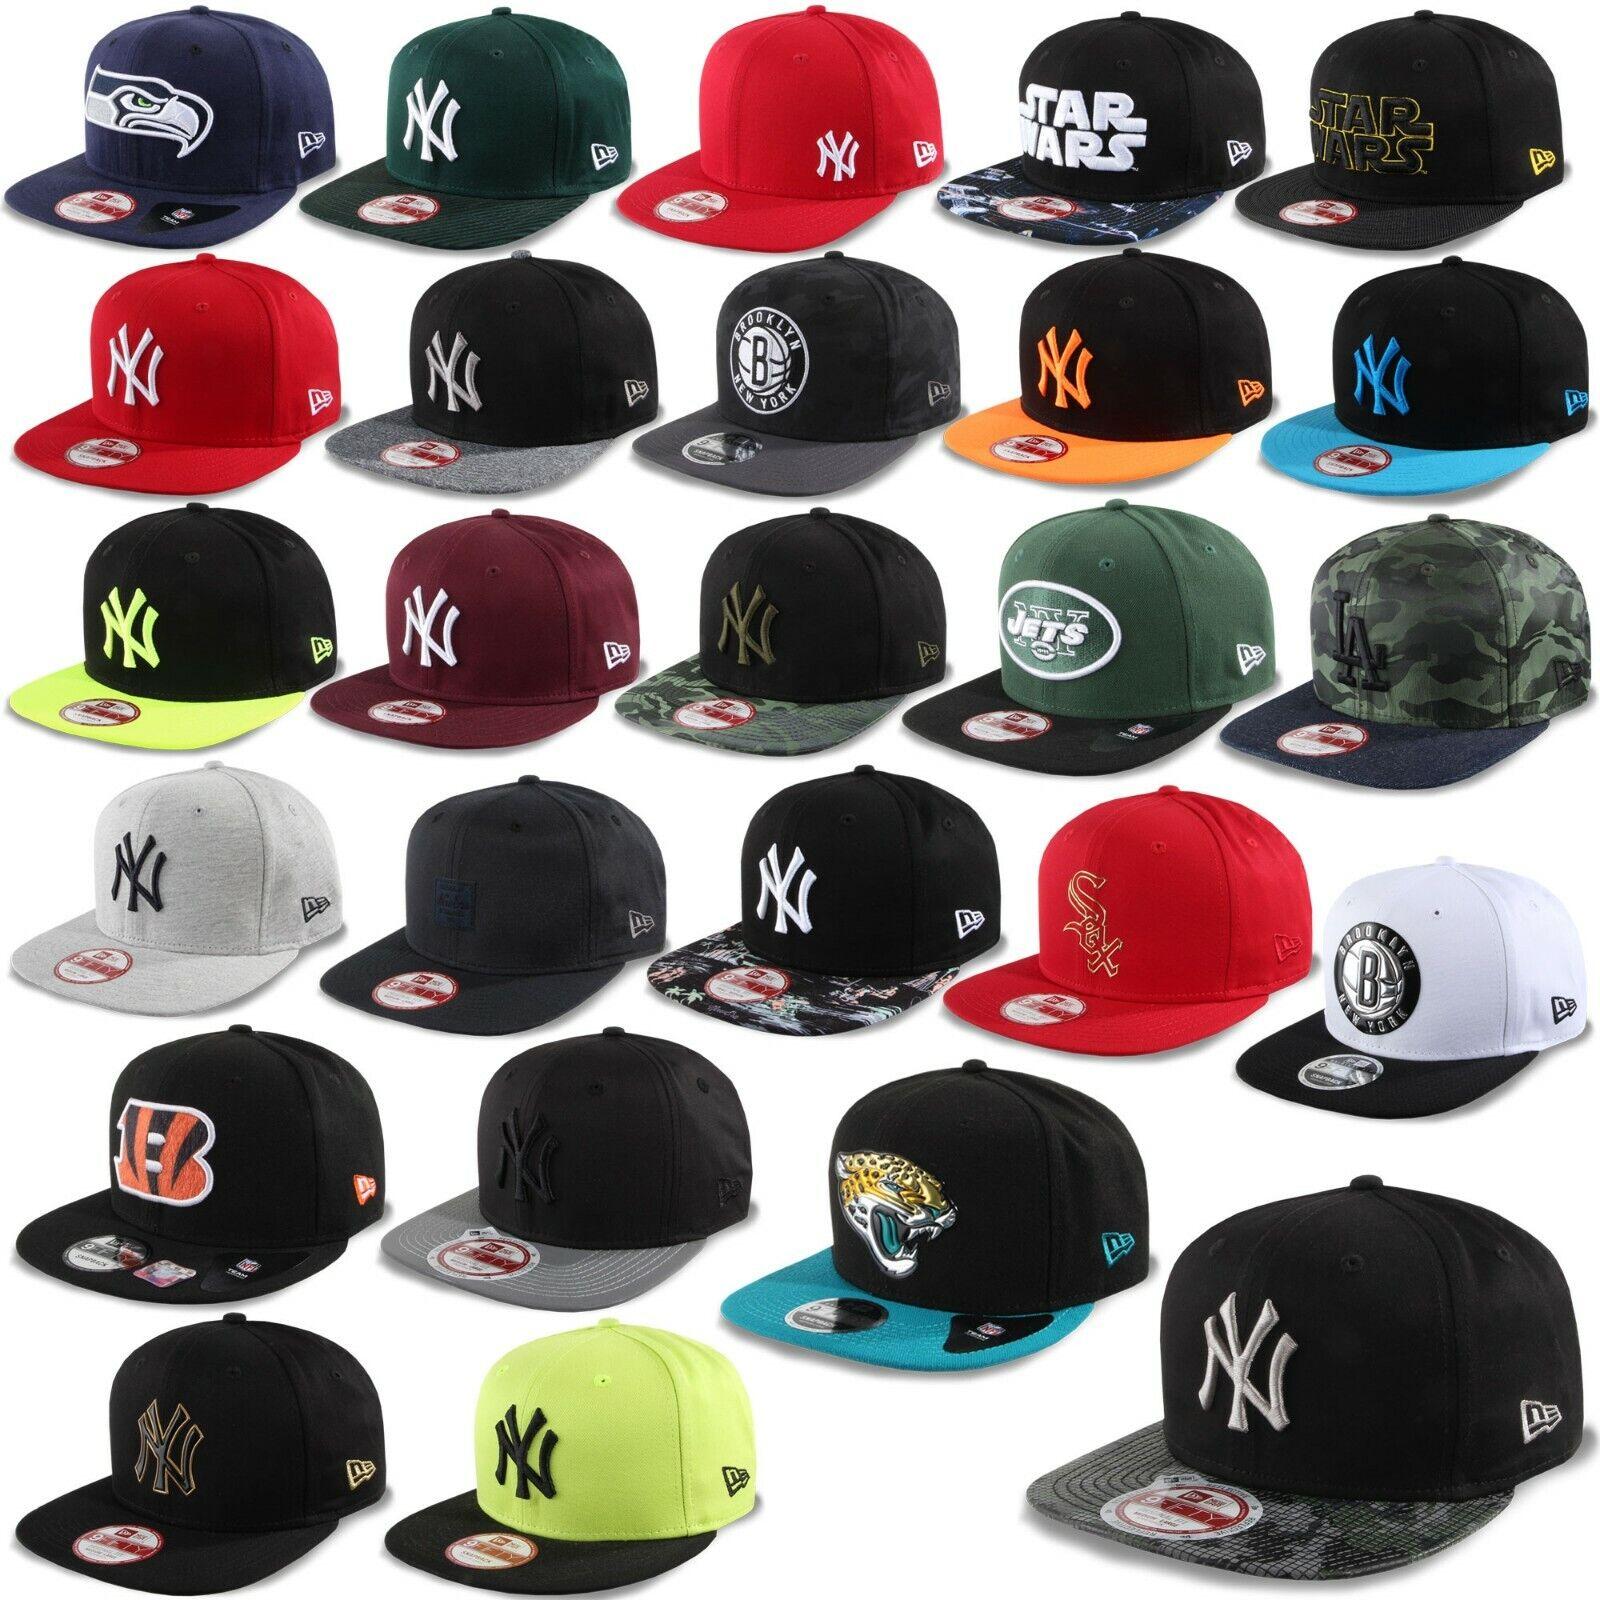 New Era Cap Snapback 9Fifty New York Yankees Seahawks Star Wars Brooklyn Nets #K